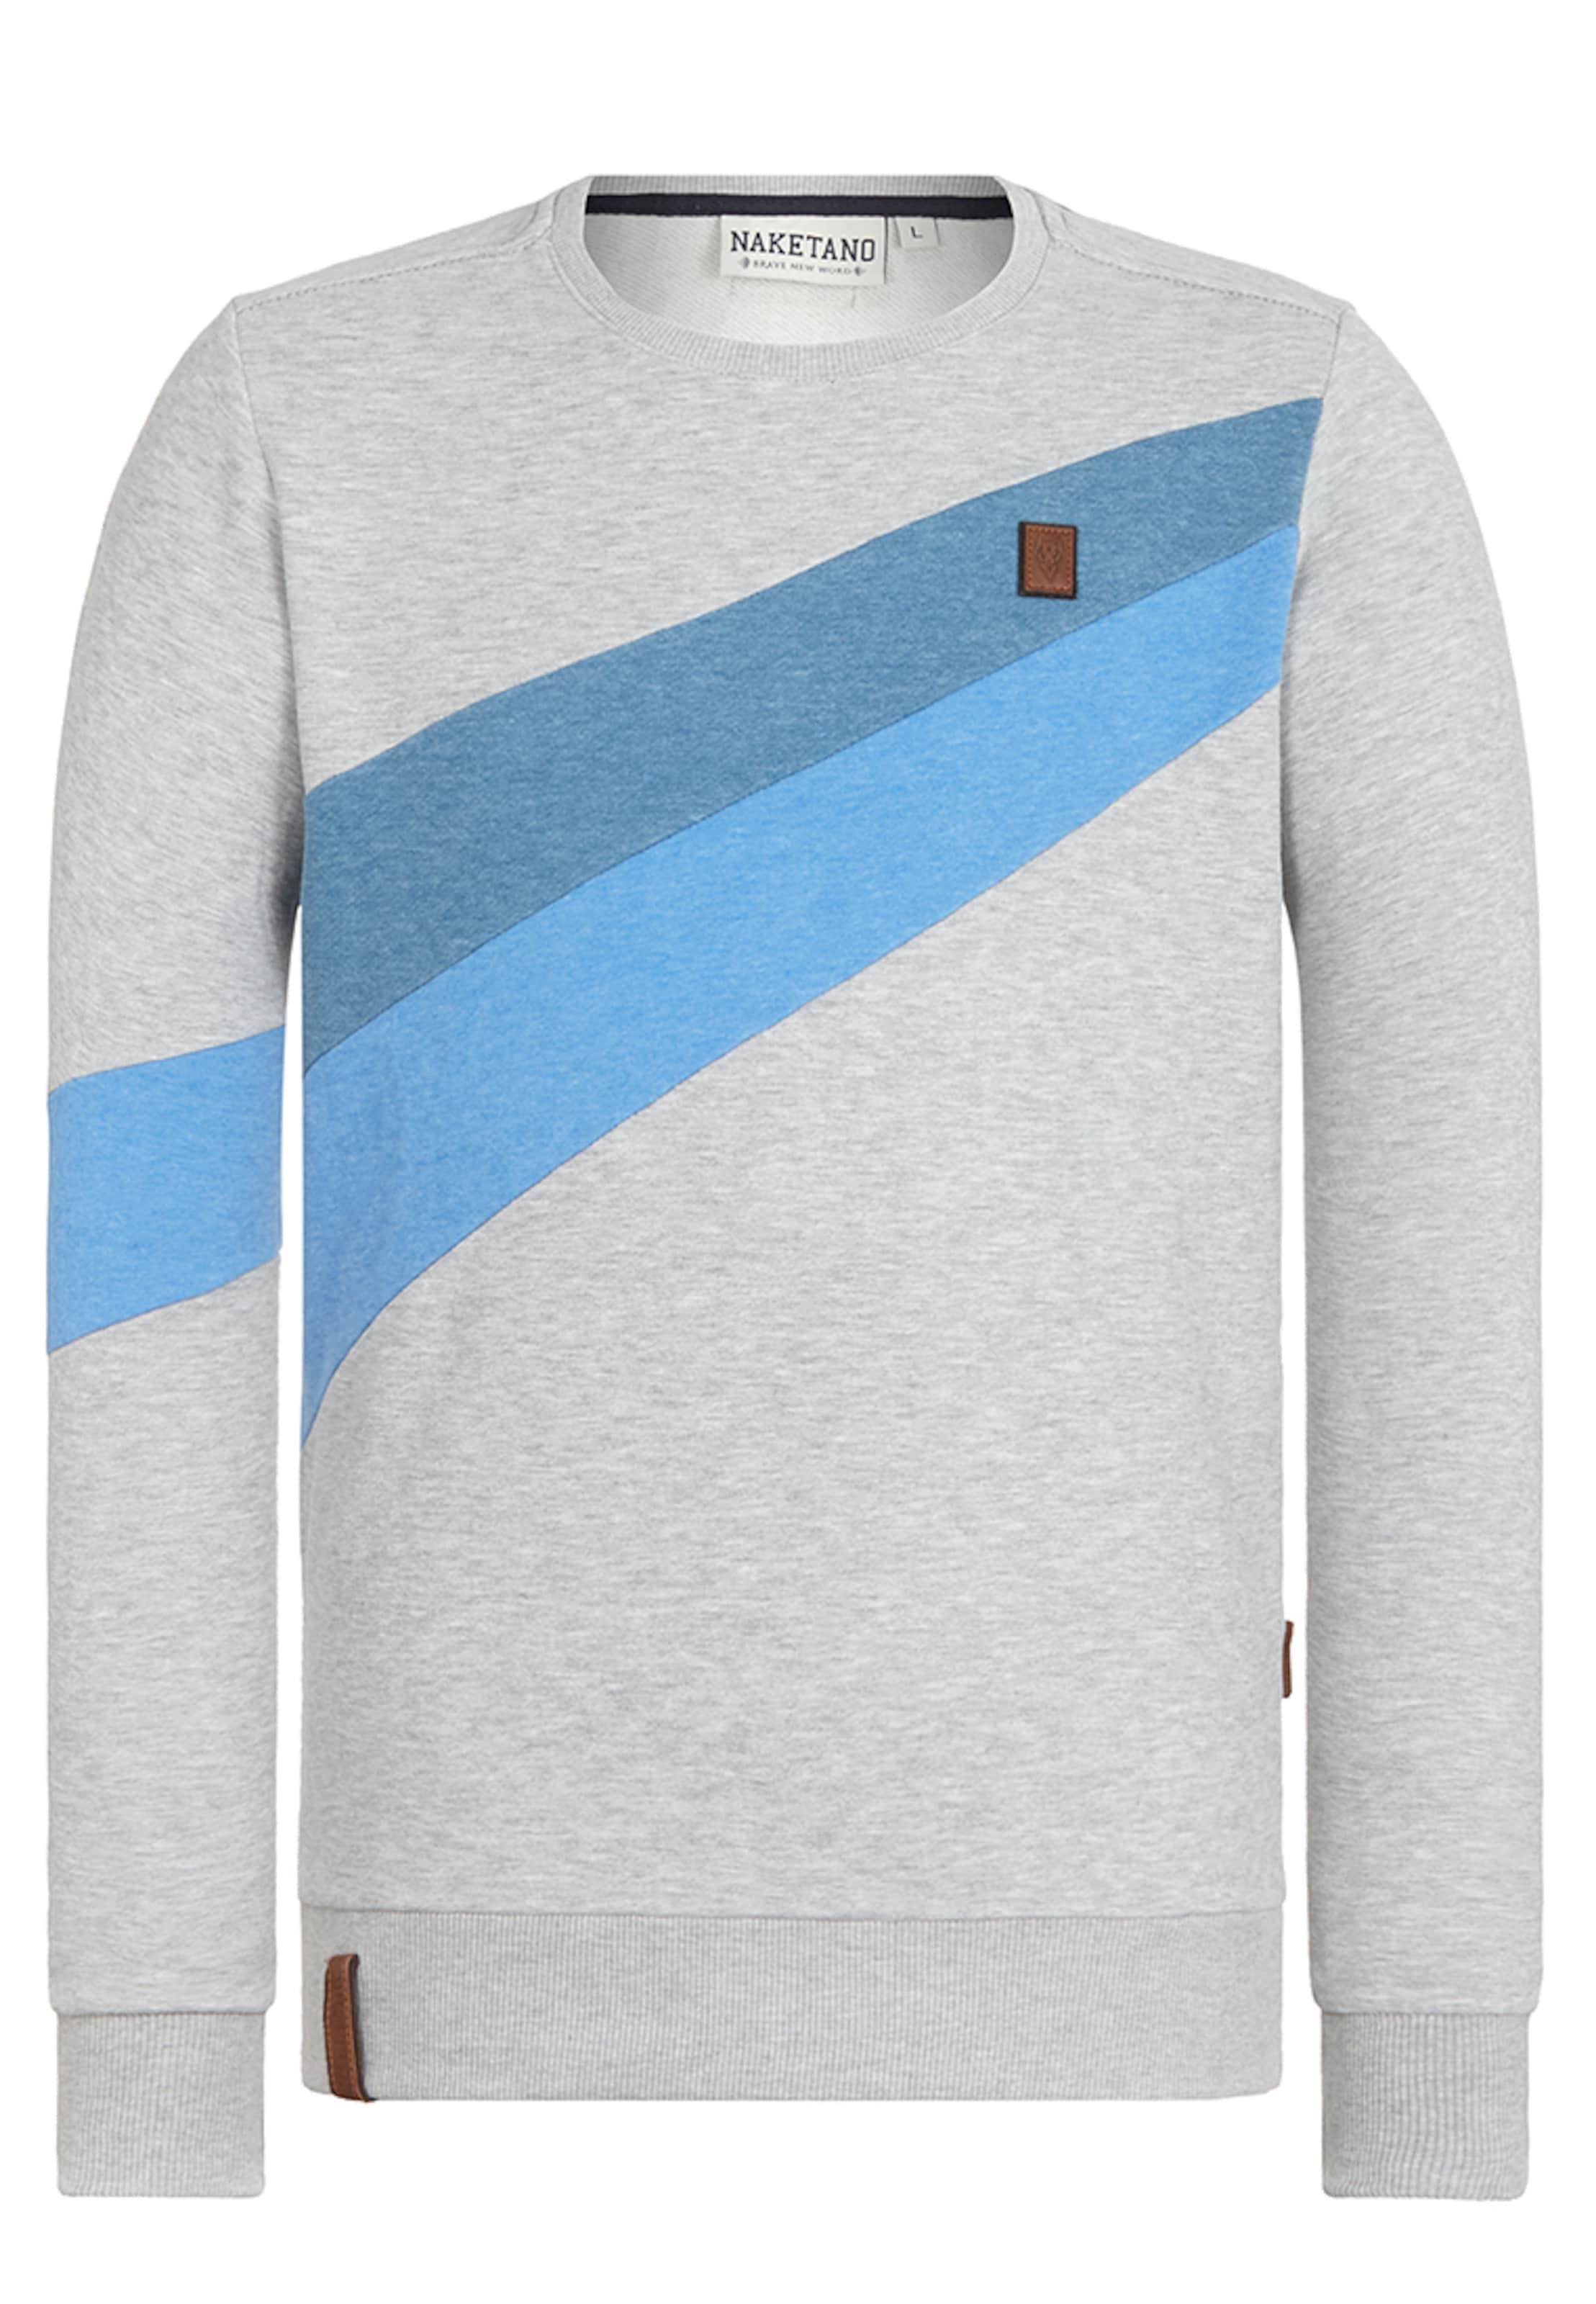 naketano Male Sweatshirt 'Verdammte Order 66 II'